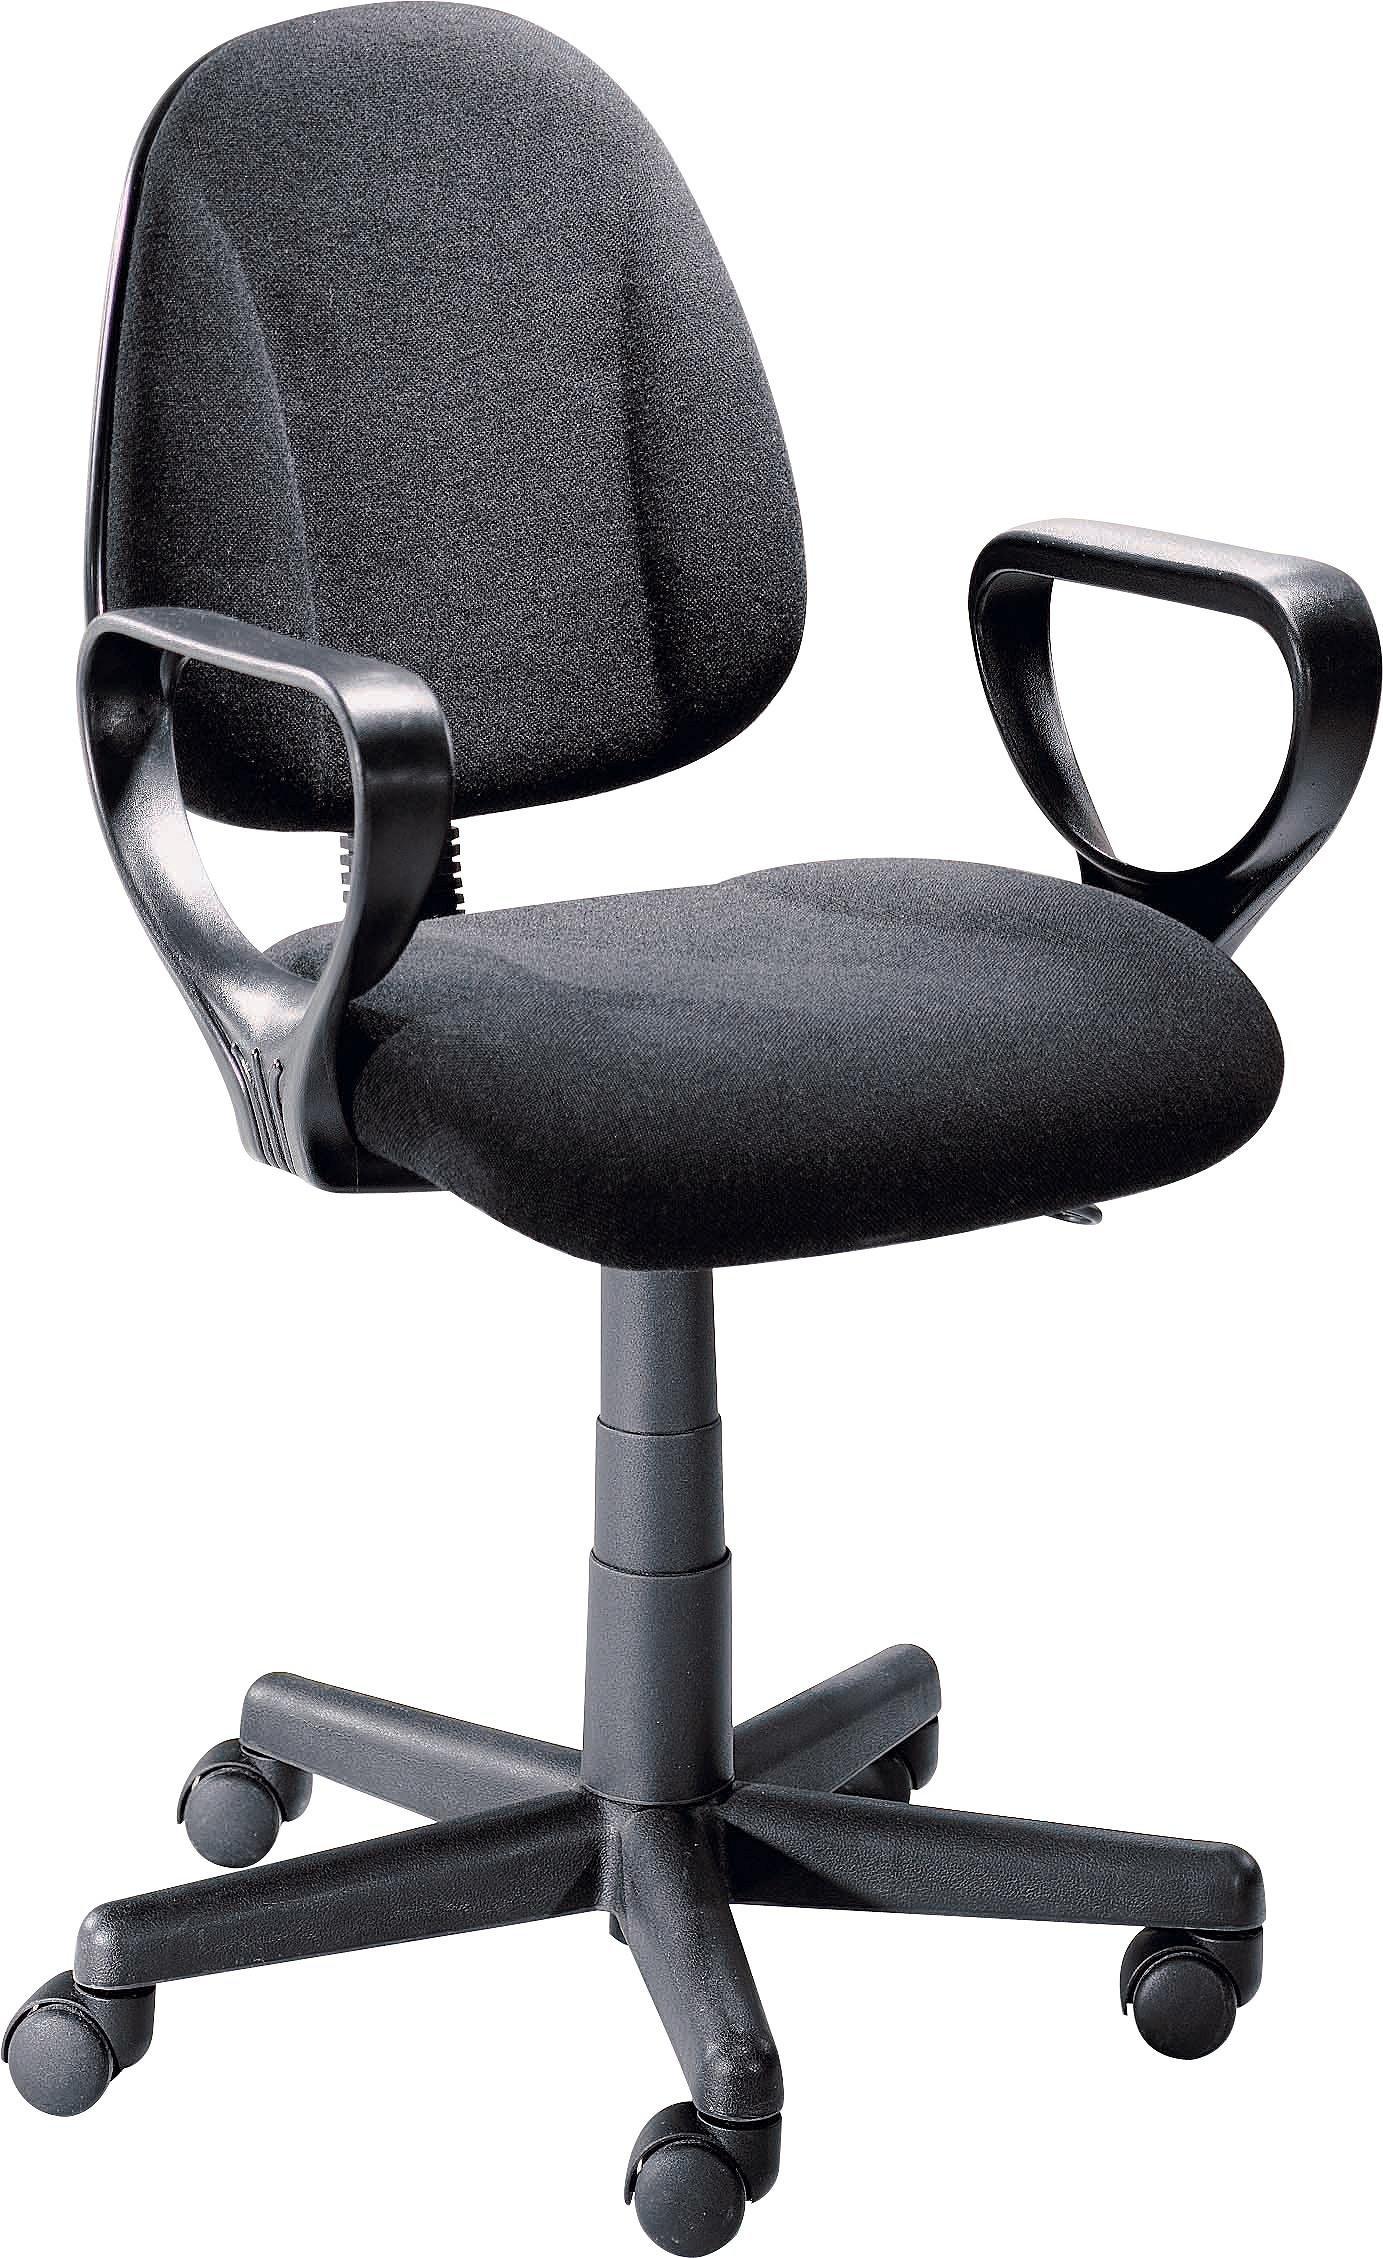 Argos Home Blake Gas Lift Adjustable Office Chair - Black, £32.49 at Argos (free c&c)